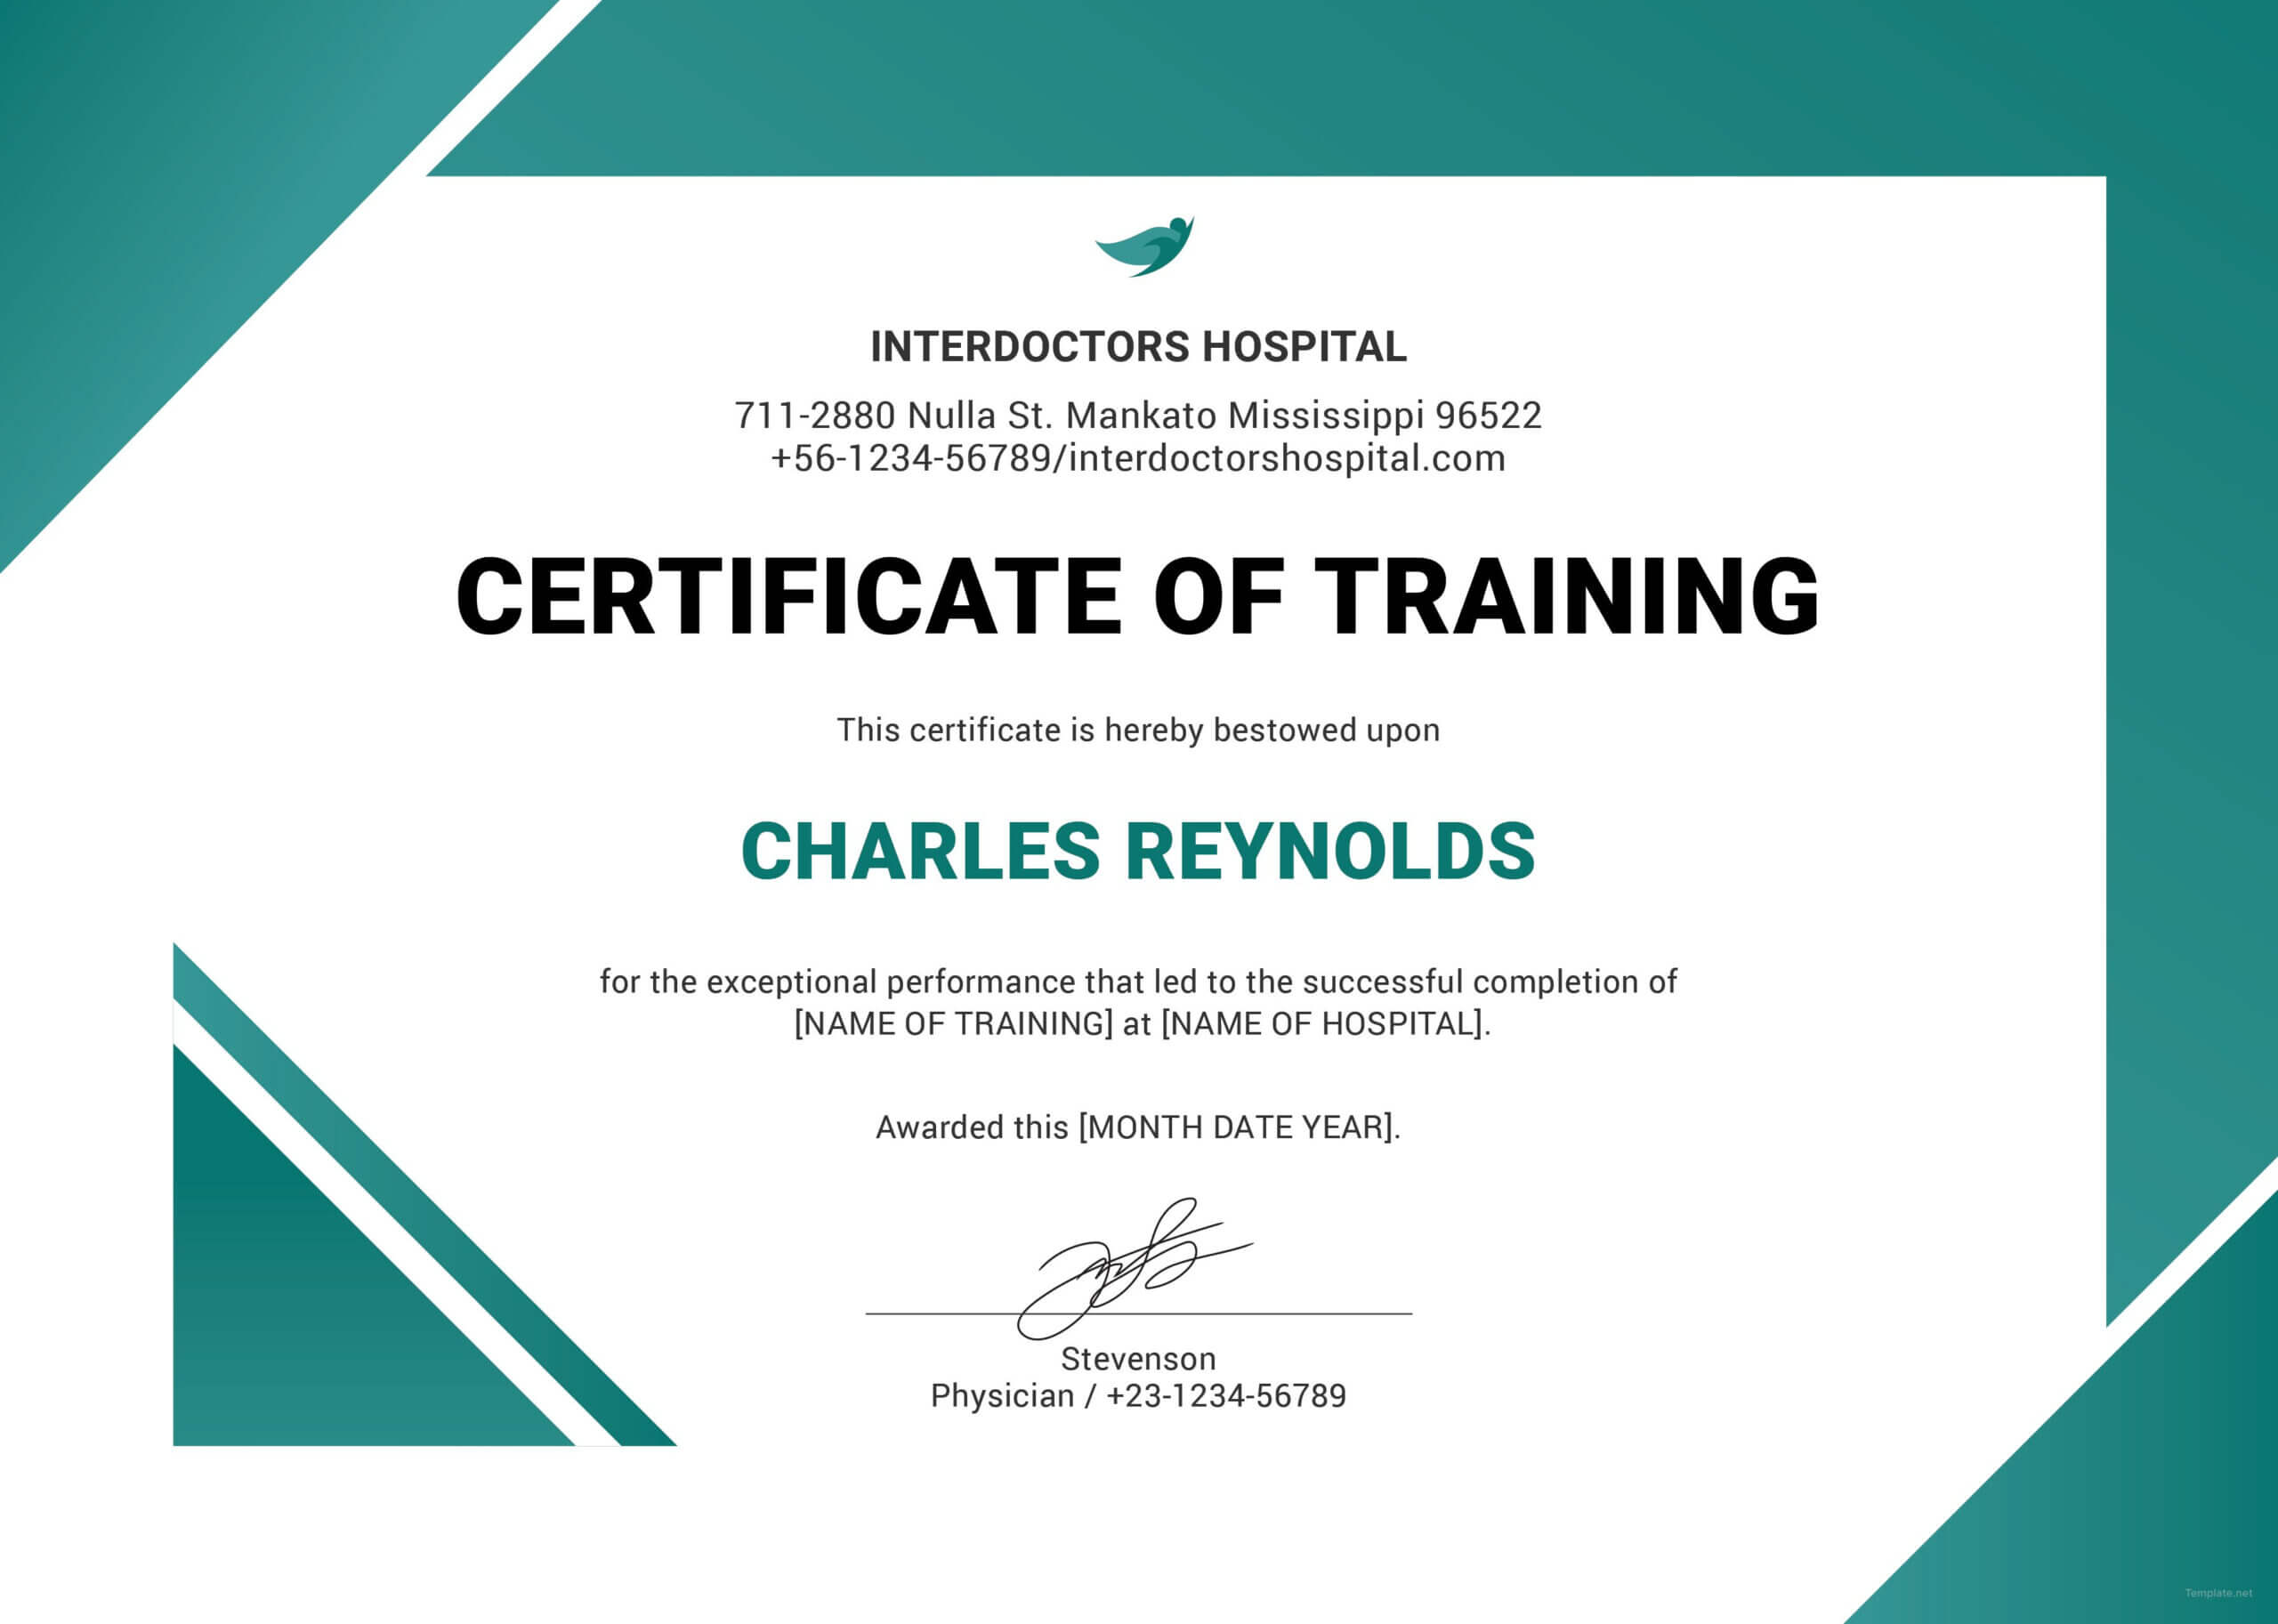 Free Hospital Training Certificate | Training Certificate Within Template For Training Certificate